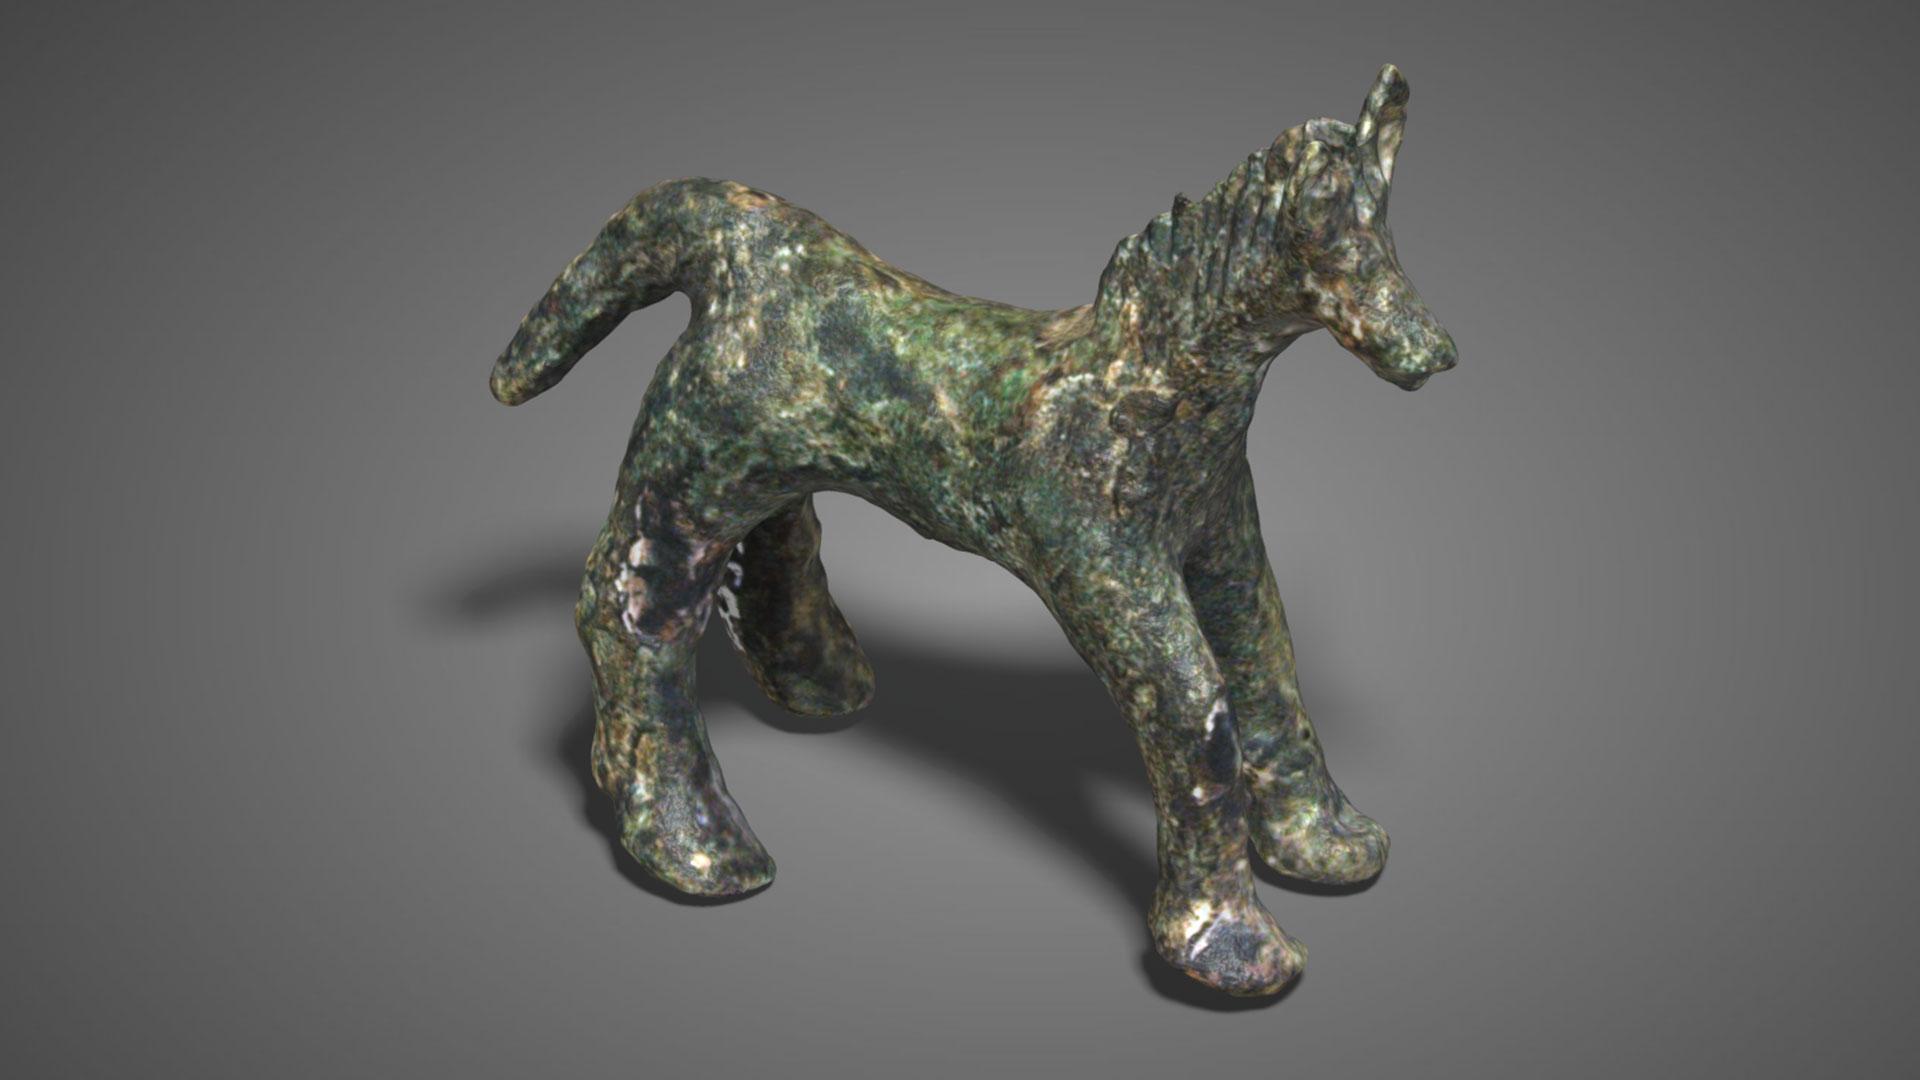 Cavallo in bronzo | Bronze Horse - 3D Model